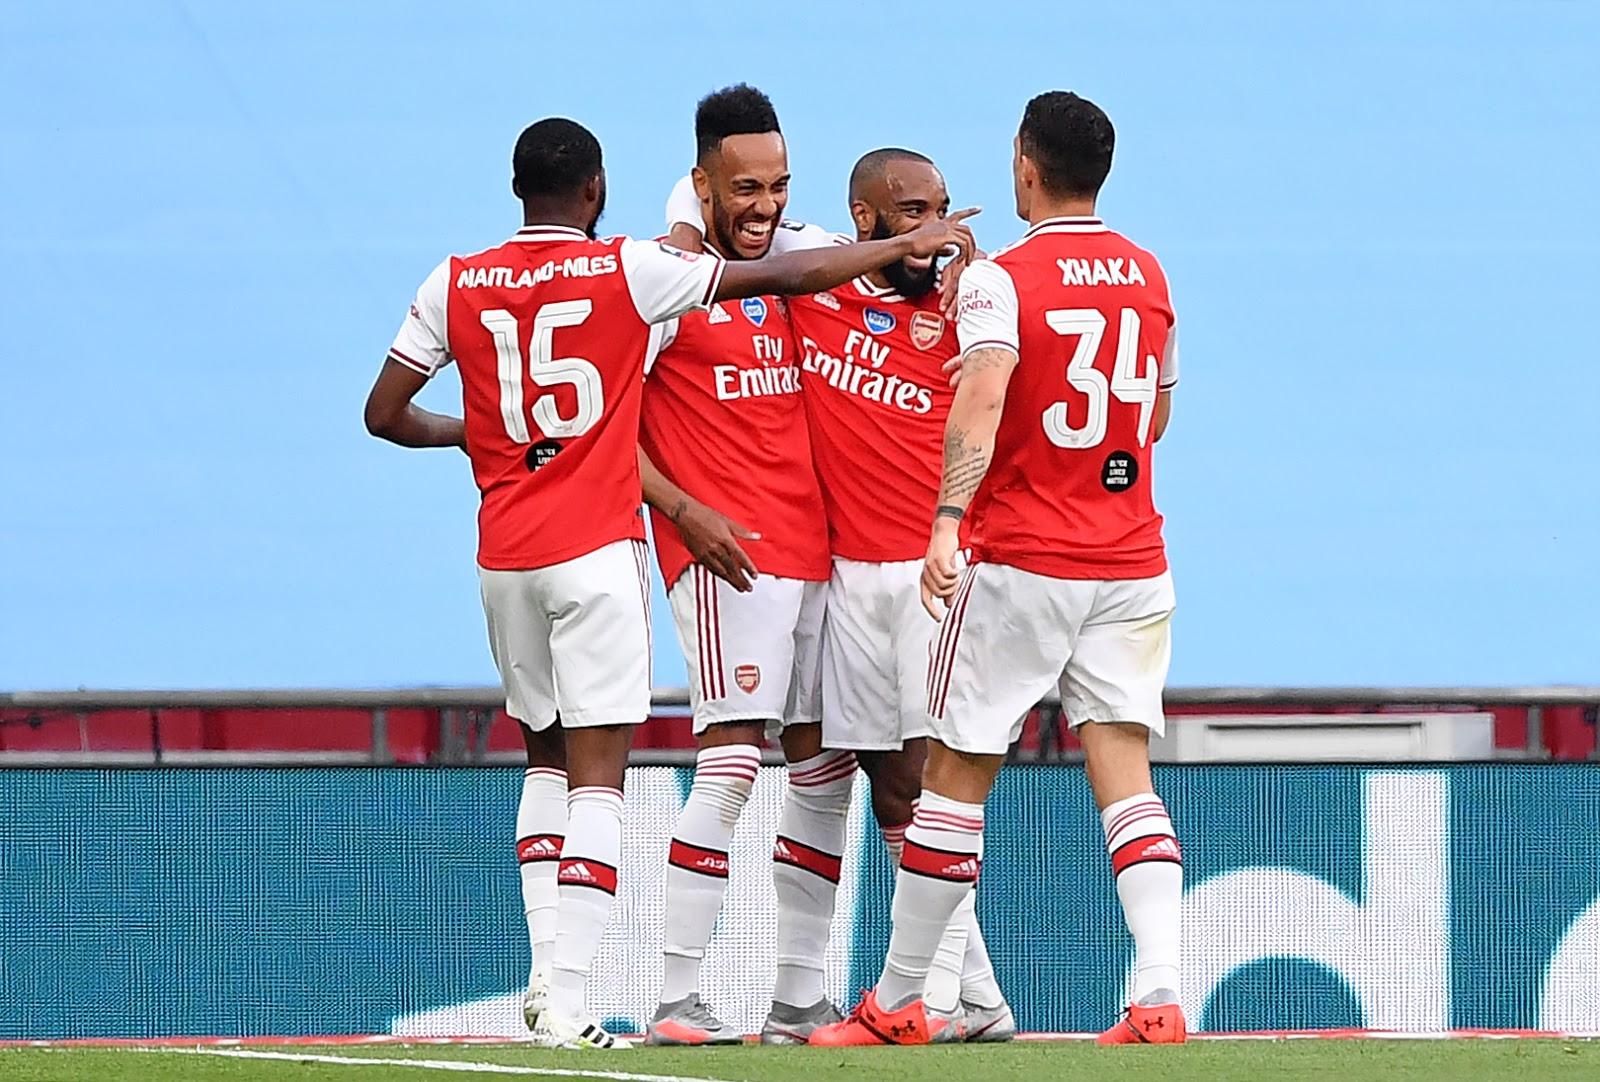 Arsenal elimina al Manchester City y pasa a la final de la FA Cup